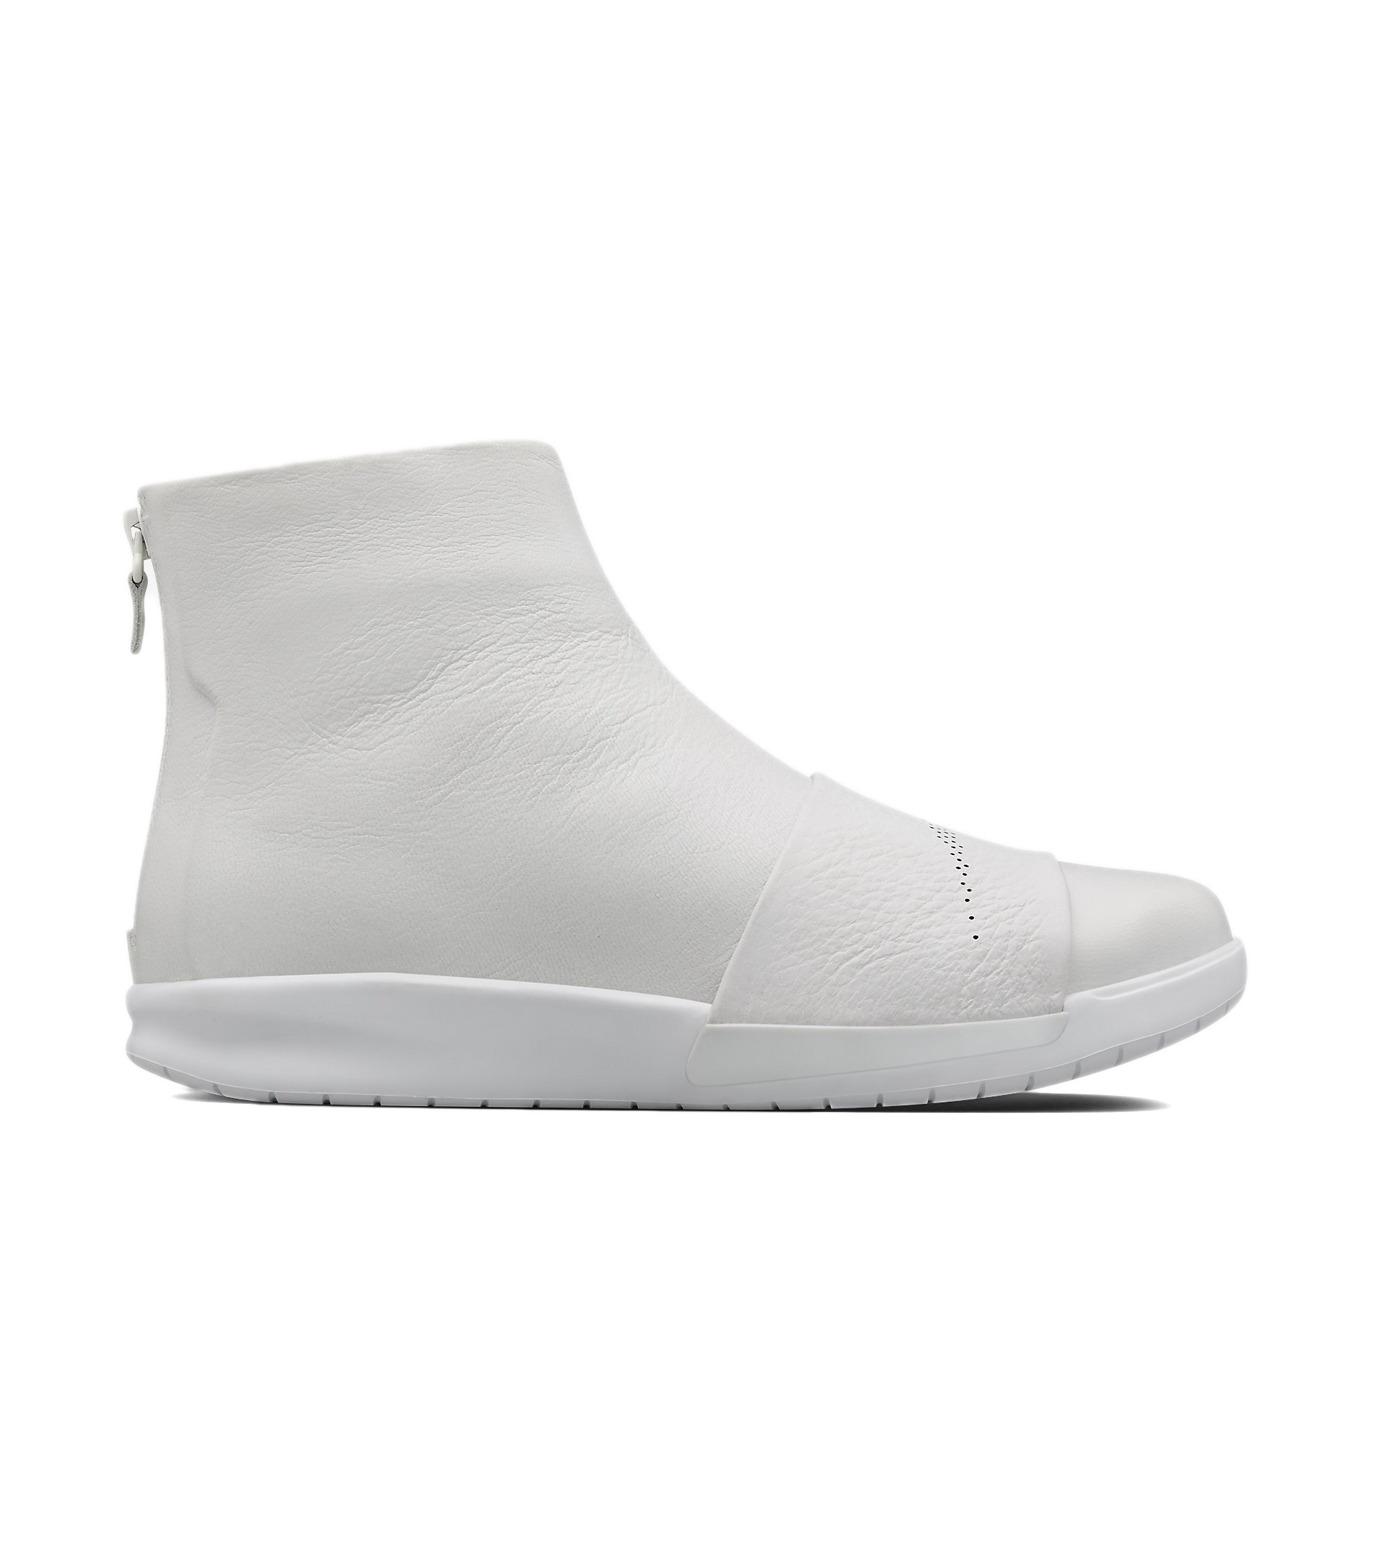 NIKE(ナイキ)のBenassi SI-WHITE(シューズ/shoes)-819683-100-4 拡大詳細画像1